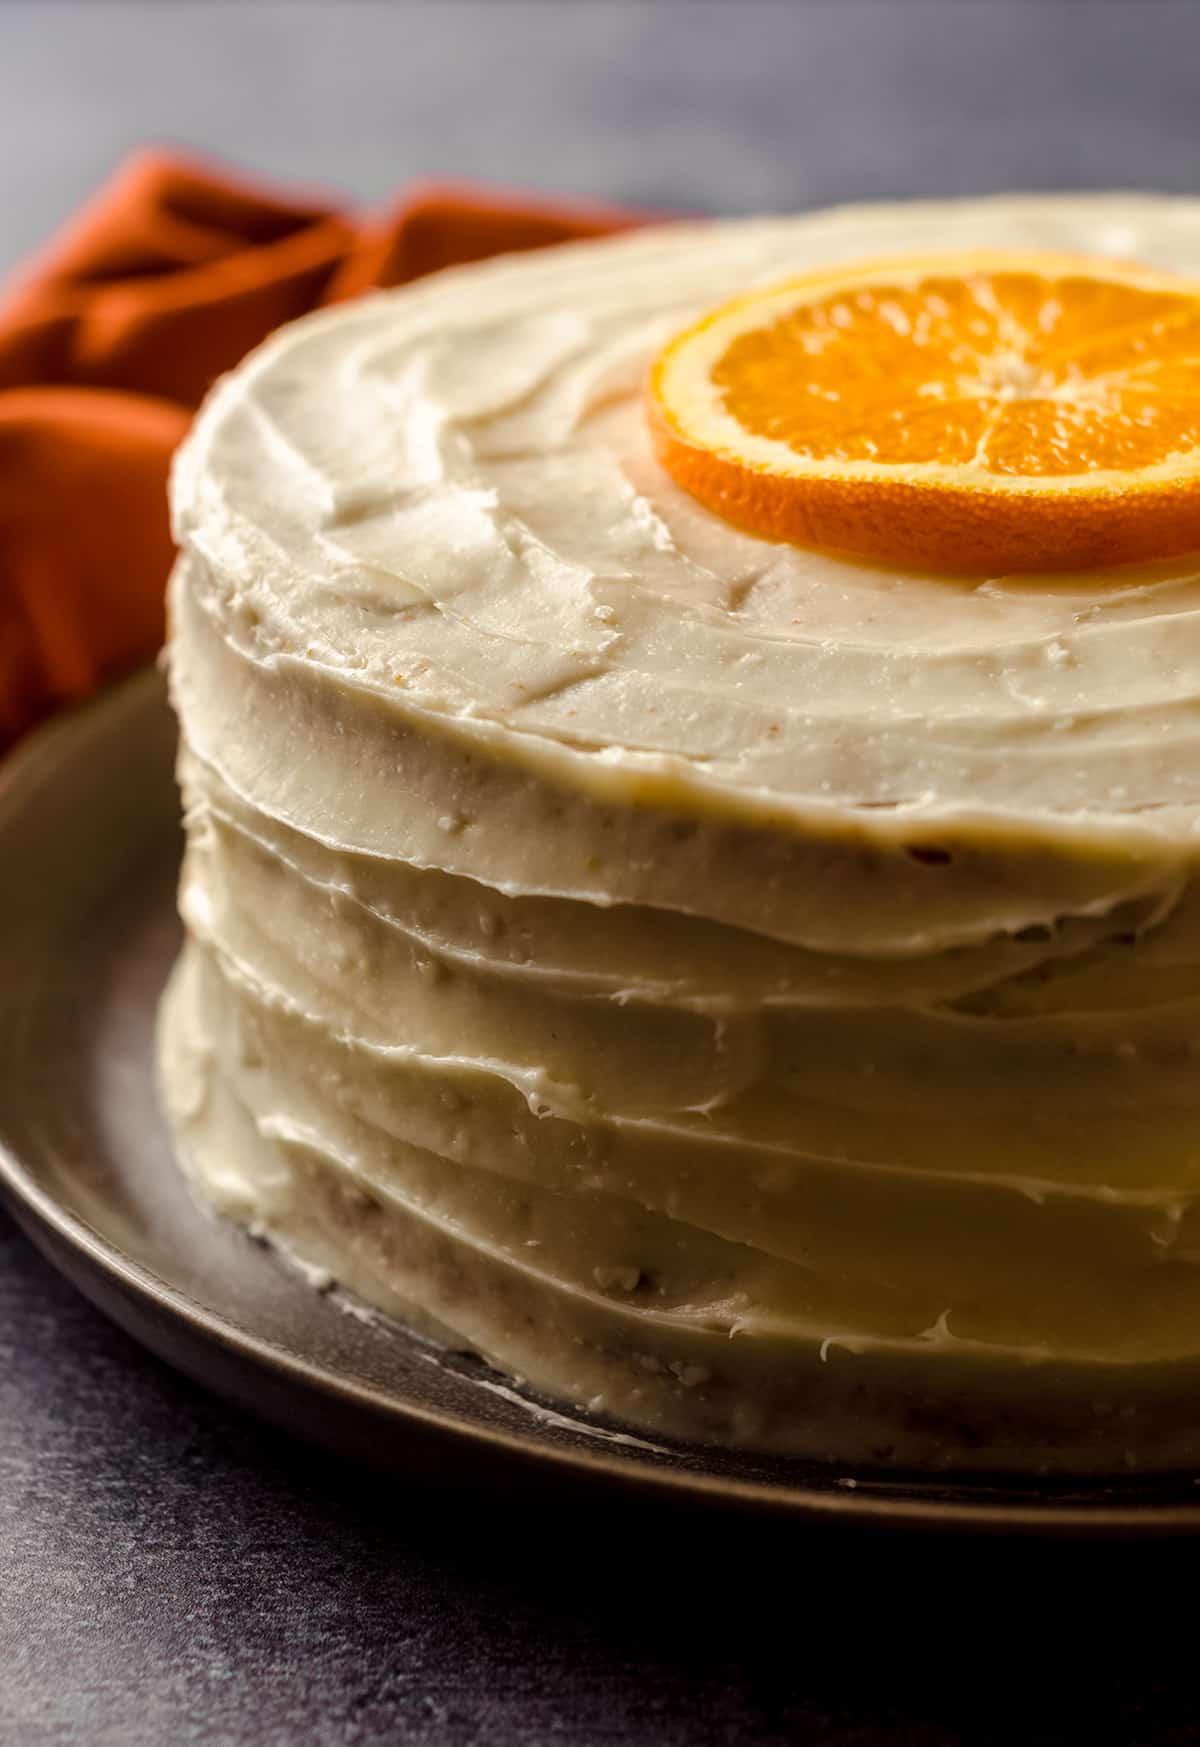 orange creamsicle layer cake on a plate